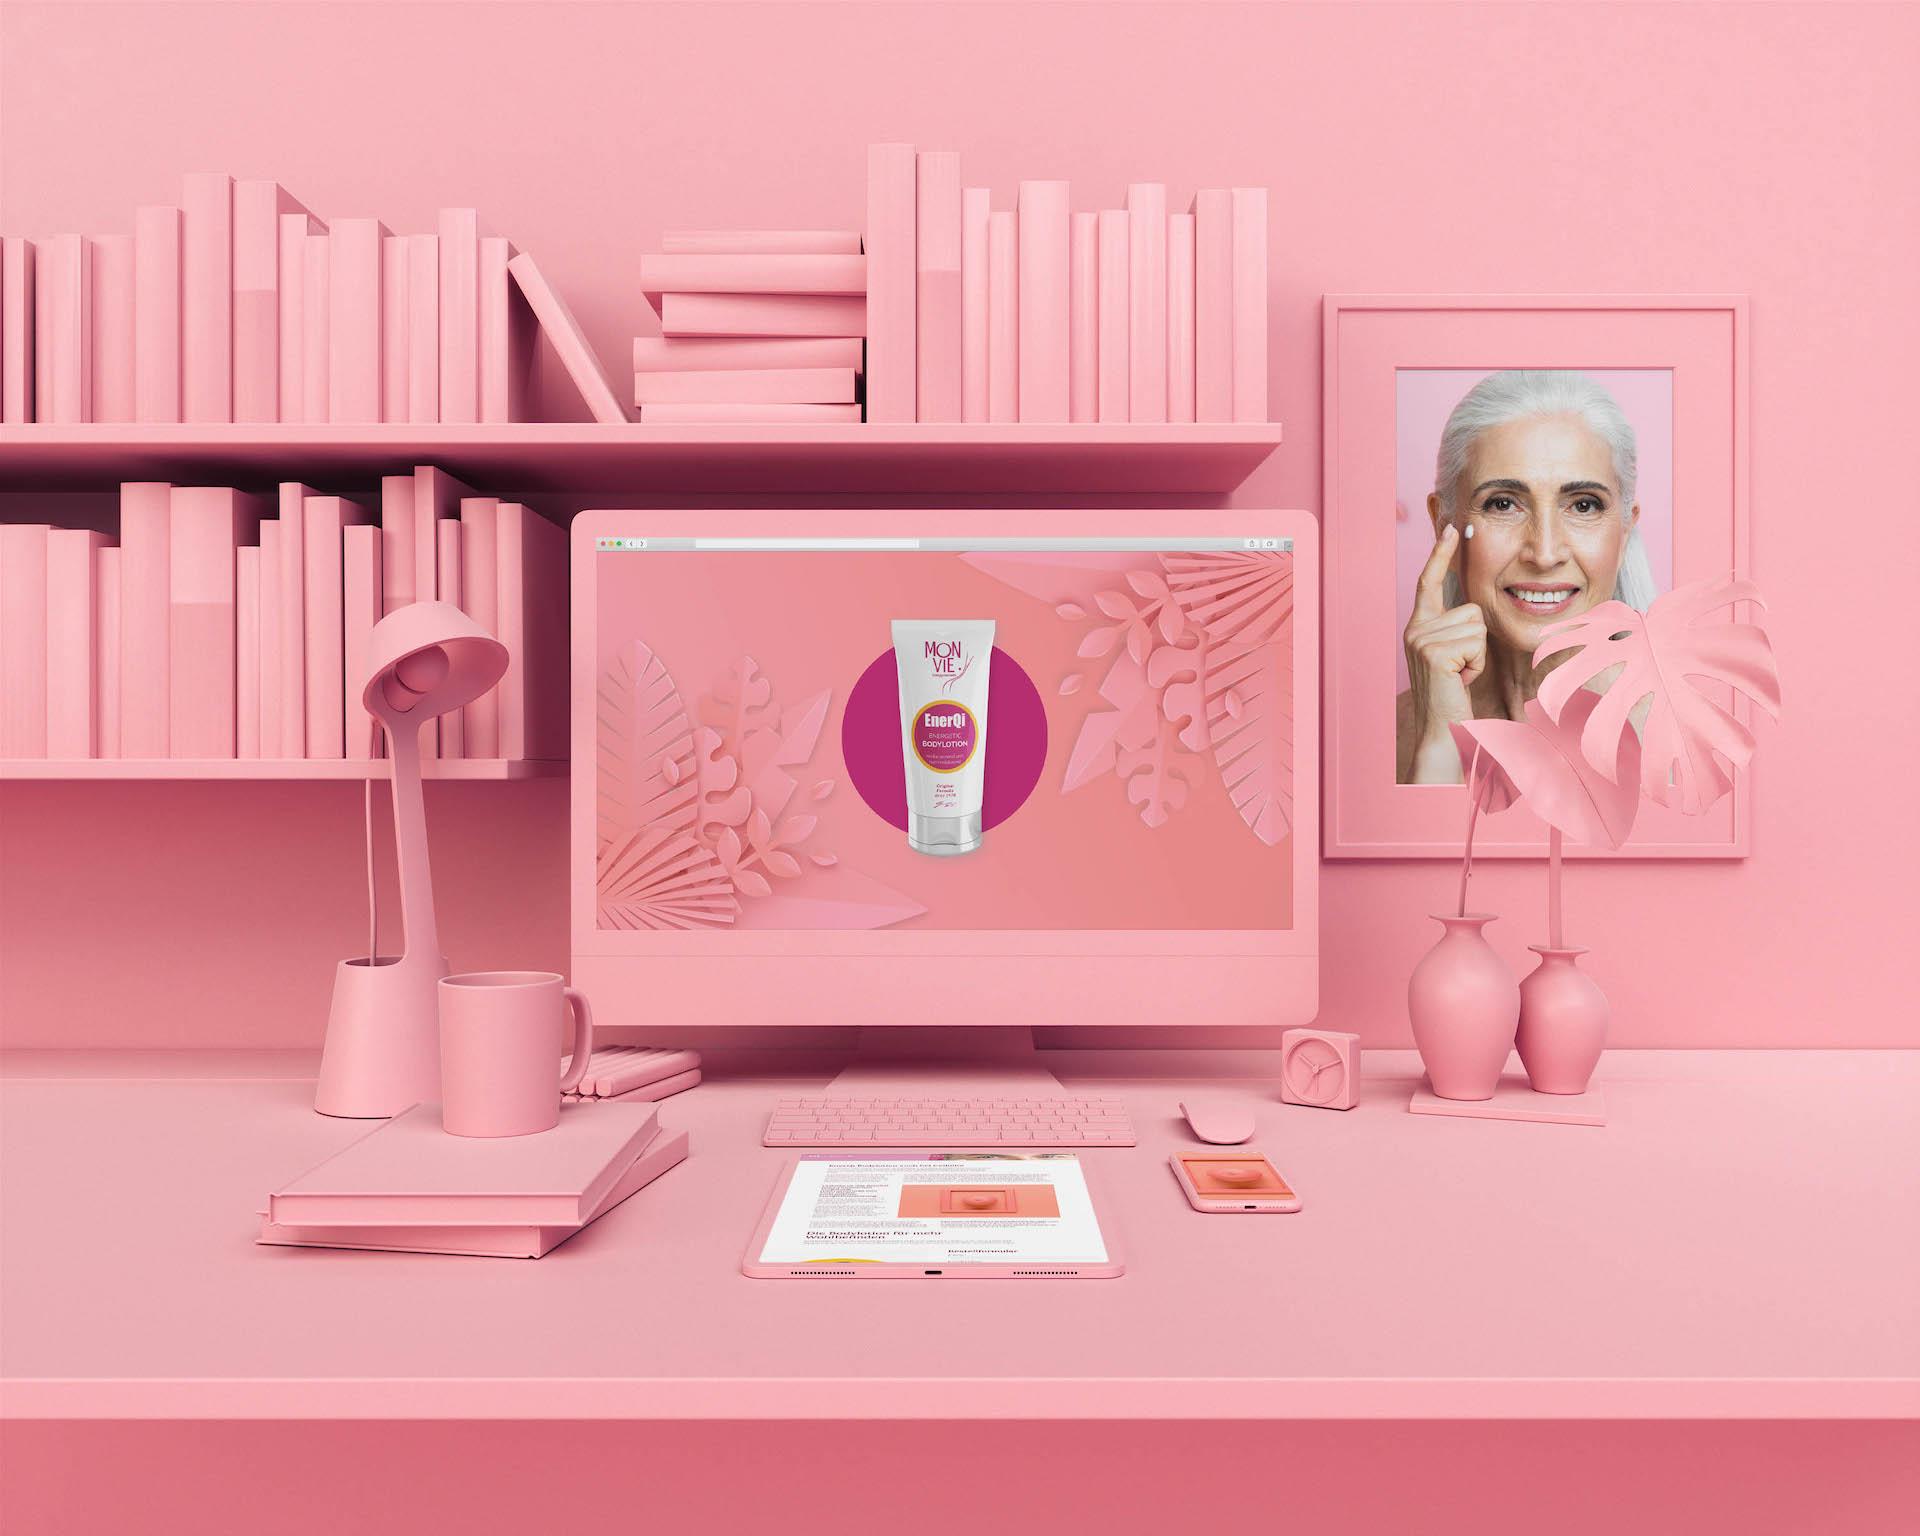 minuteman's Portfolio - Monvie EnerQi Energiekosmetik - Bodylotion und Massagecreme - rosa unicolor Mockup mit alter Dame